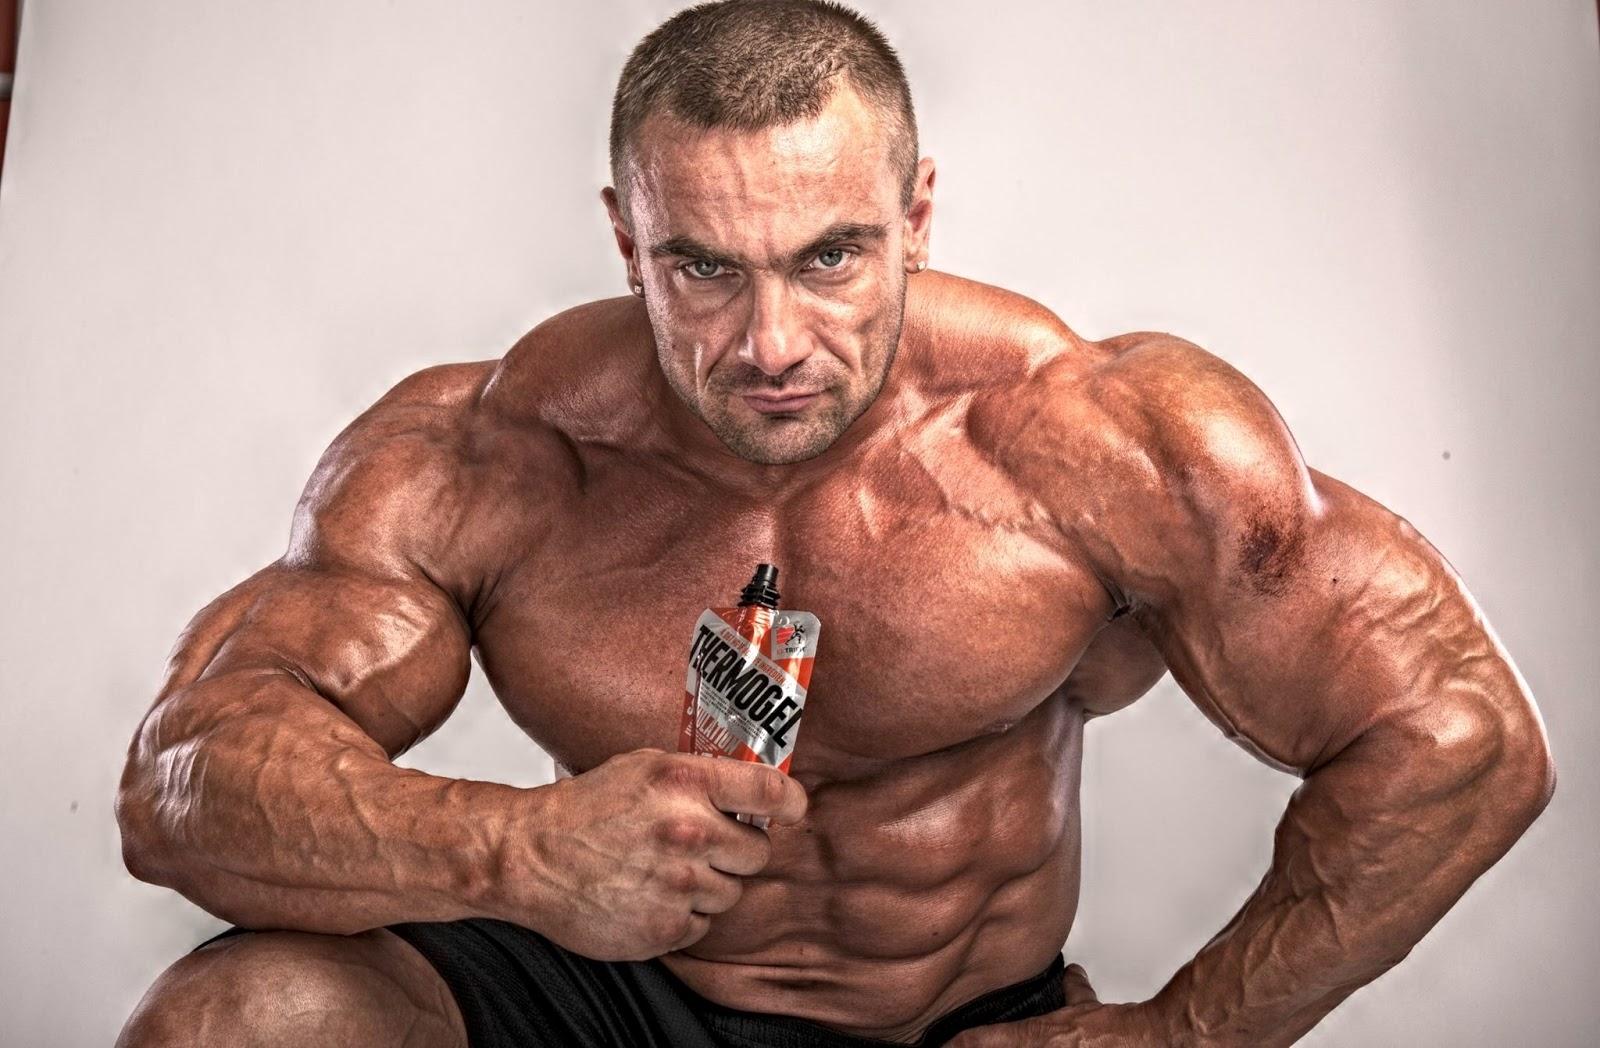 Muscle Ammiratore: IFBB PRO Tomáš Kašpar from Czech Republic